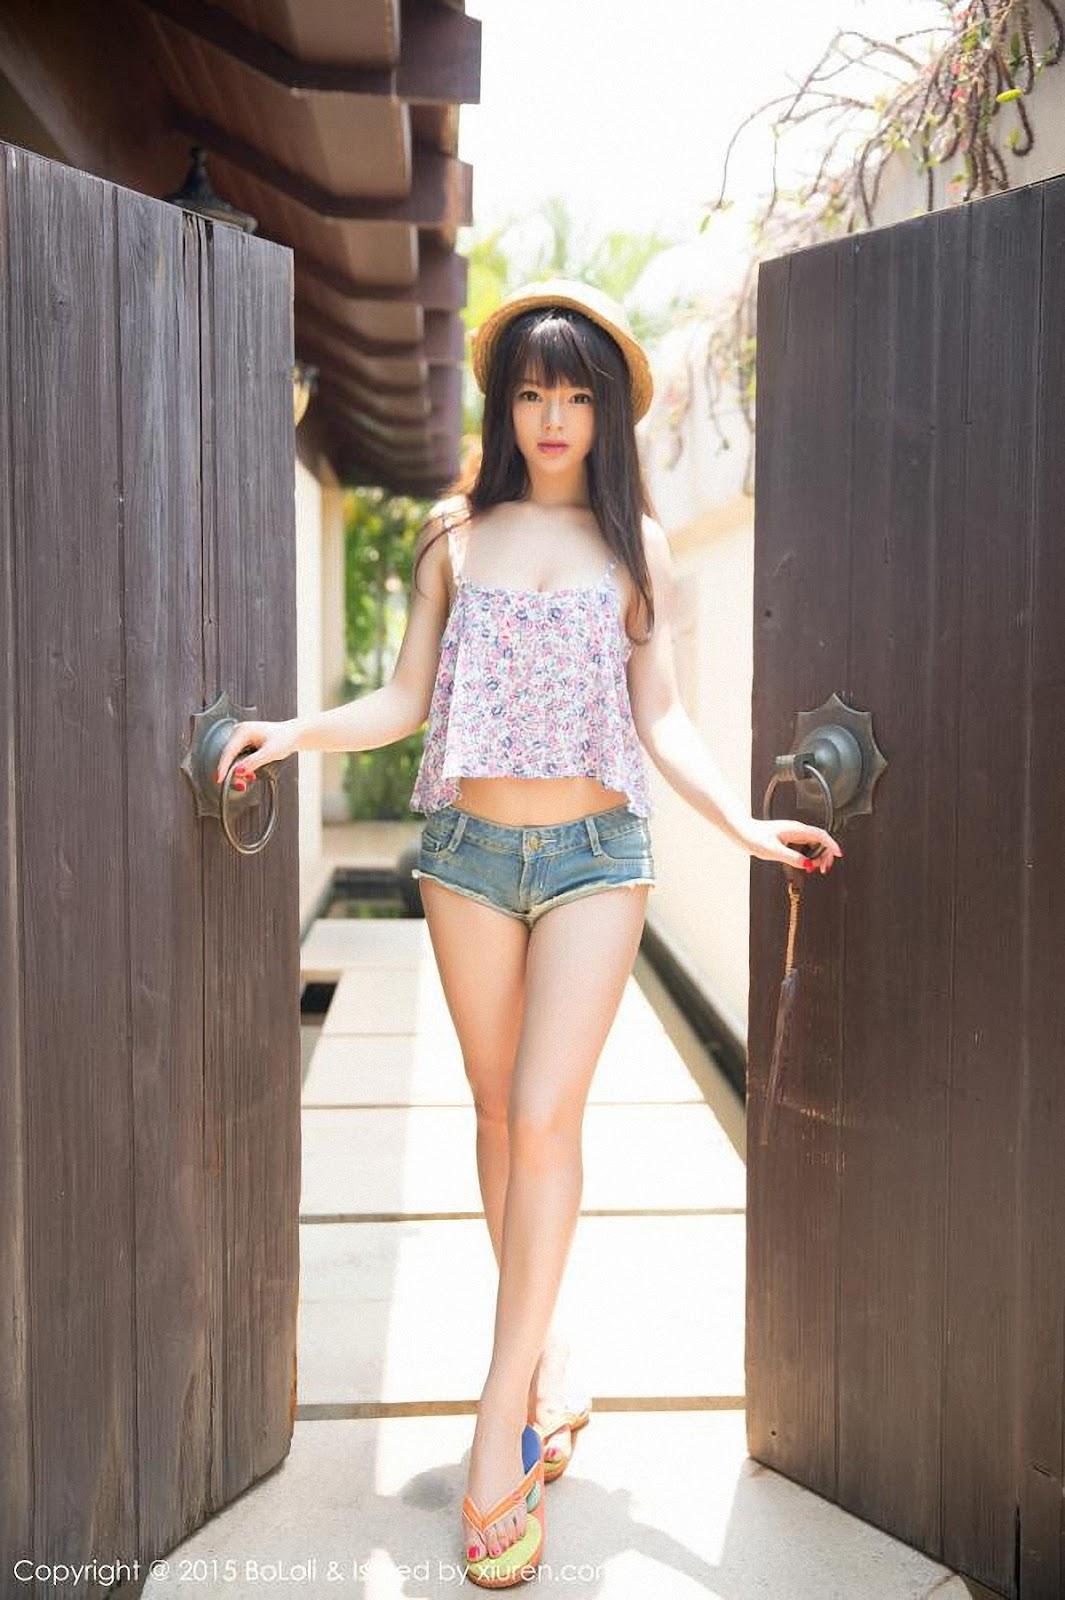 BoLoli Vol.024 Model: AngelaLee李玲